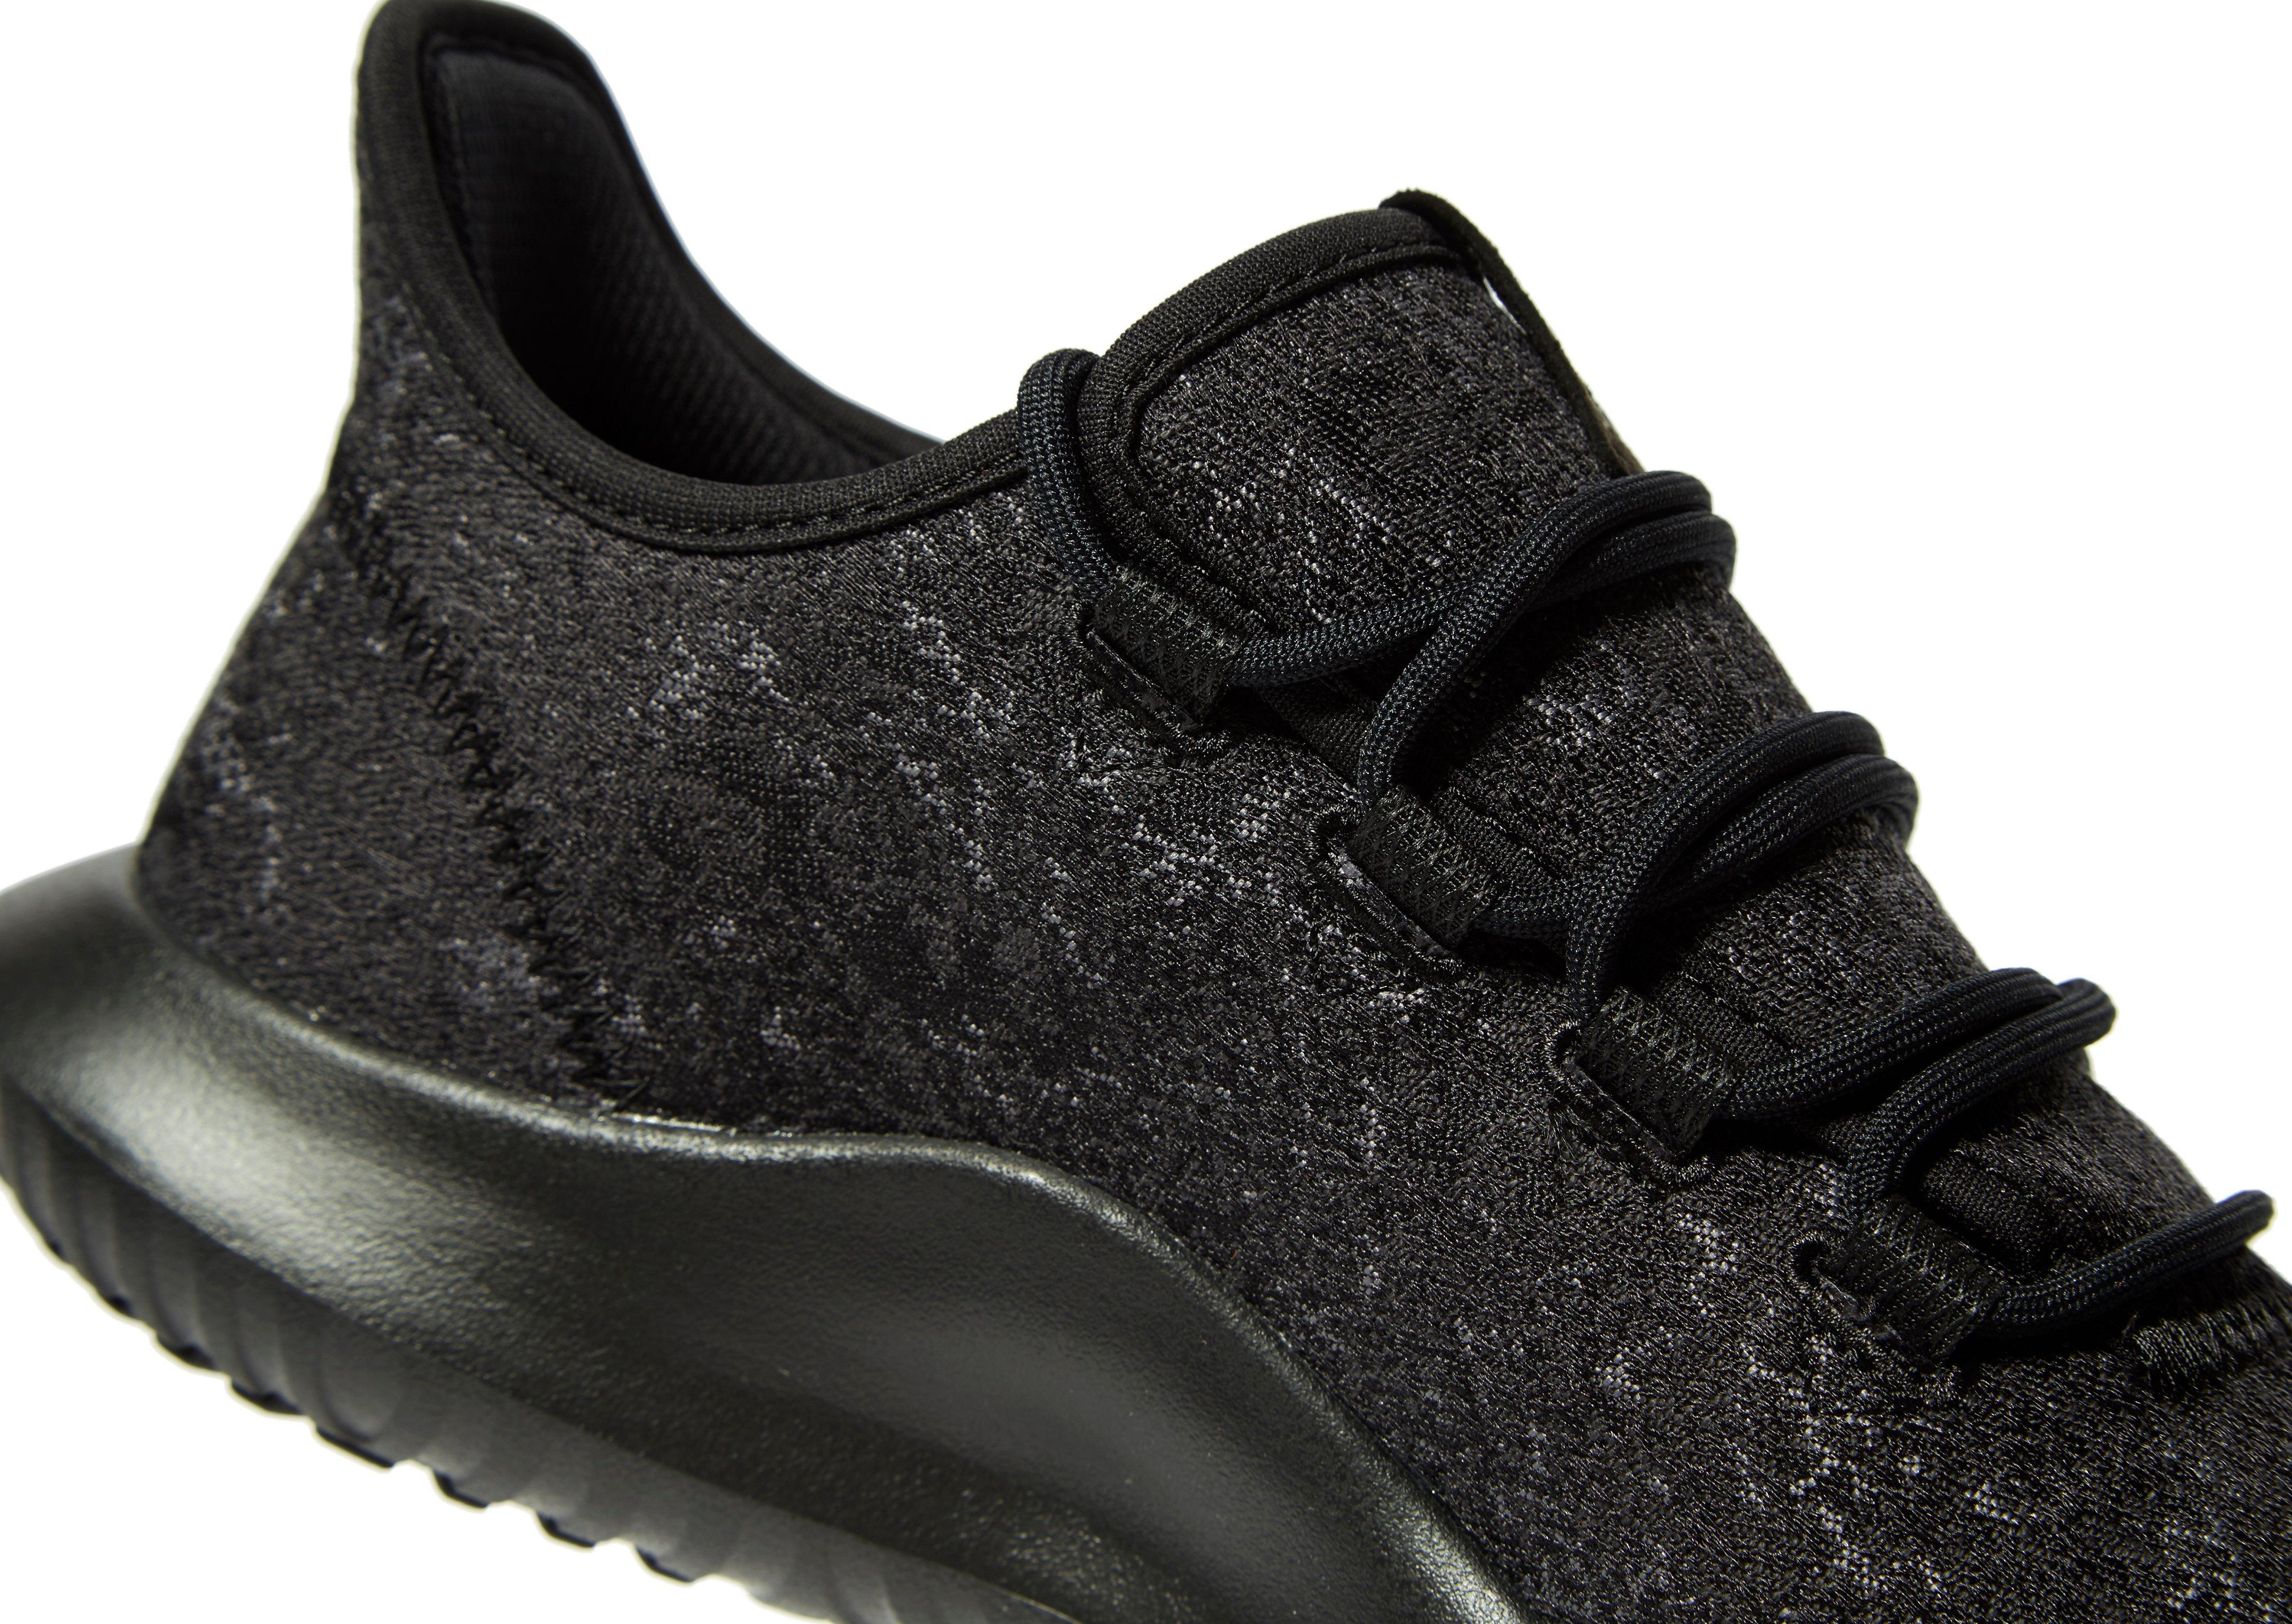 new style 807fa 562c5 Lyst - adidas Originals Tubular Shadow Jacquard in Black for Men